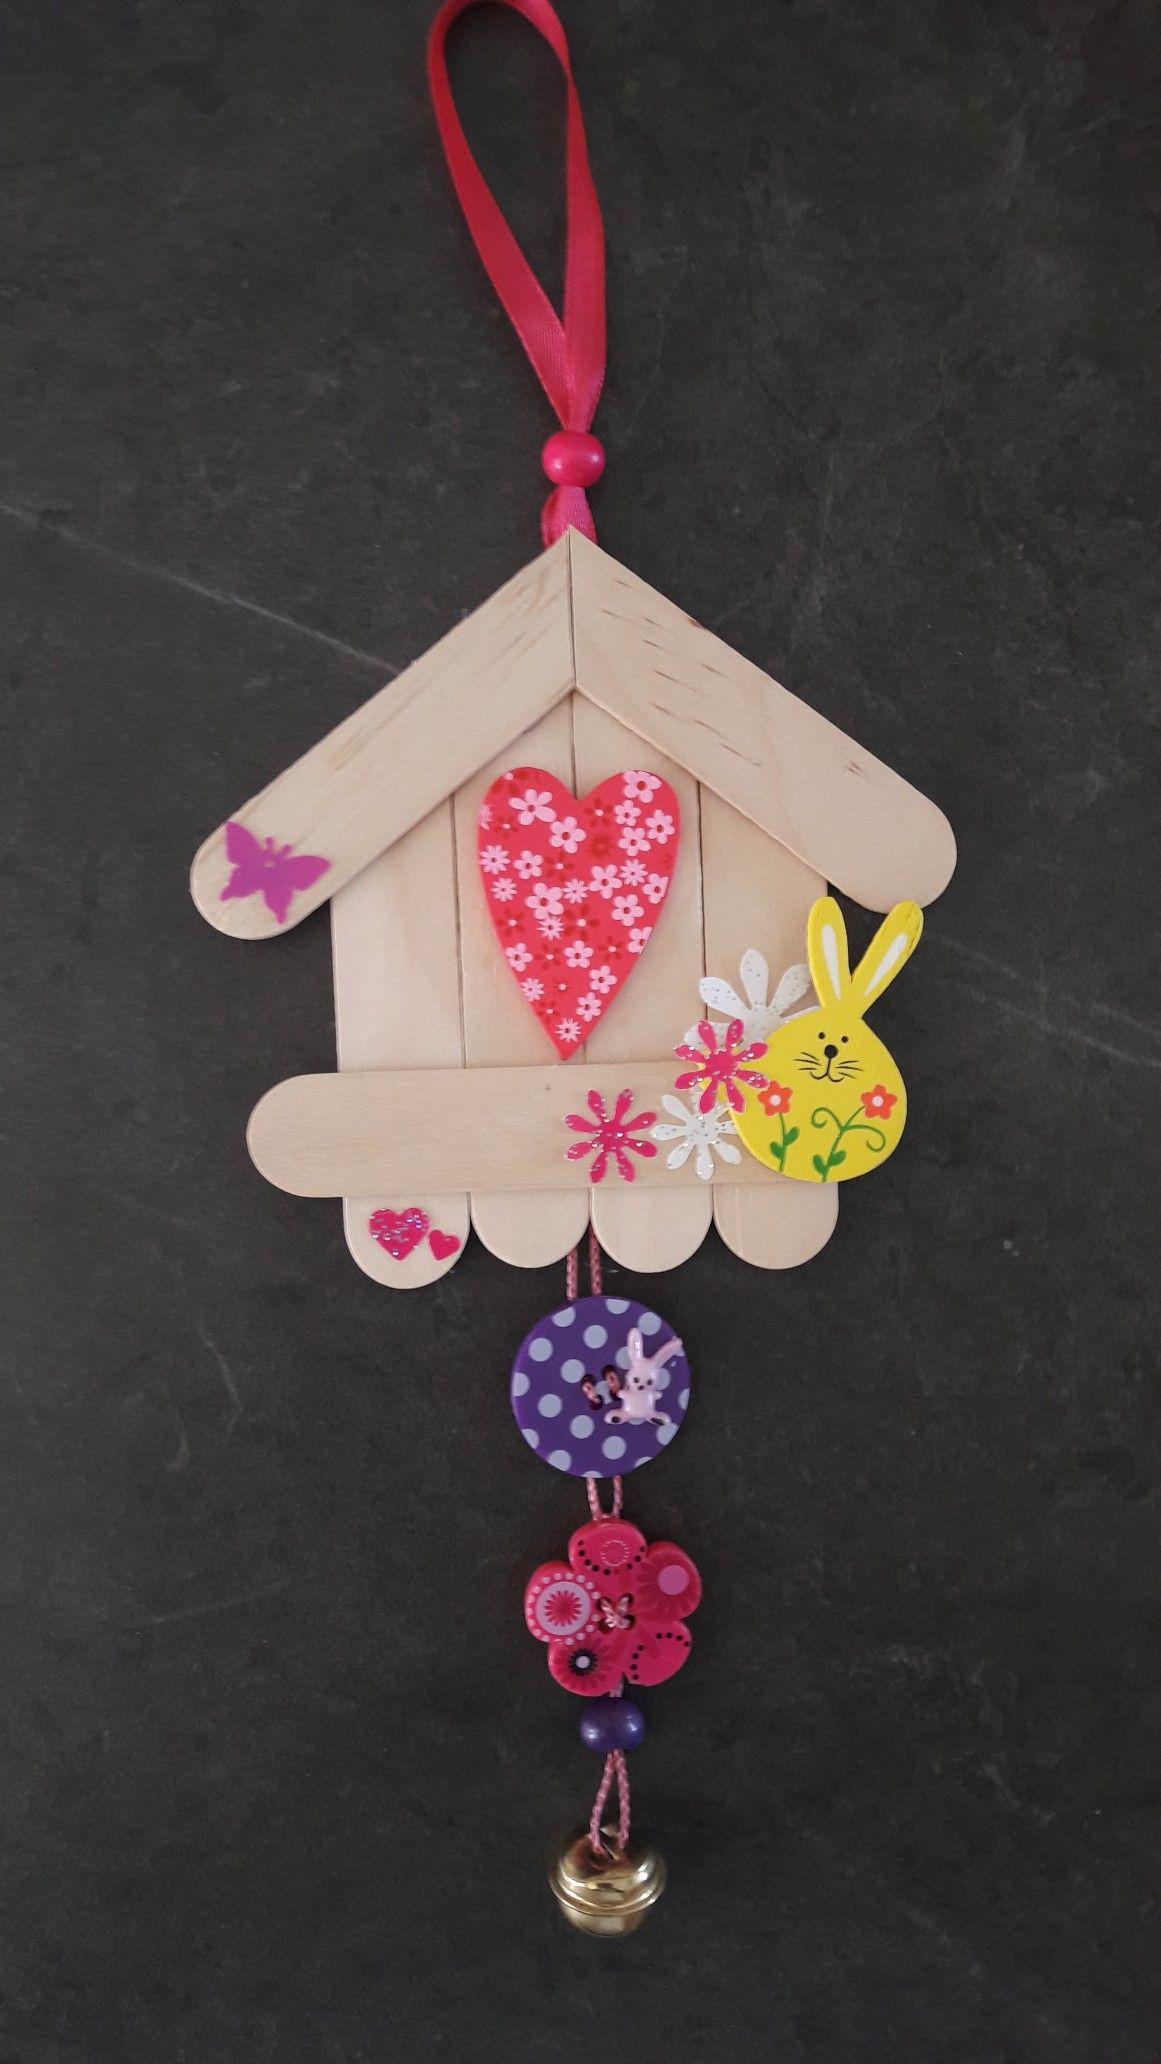 Petite suspension avec des b tonnets regalos para jardin pinterest manualidades bricolaje - Manualidades y bricolaje ...